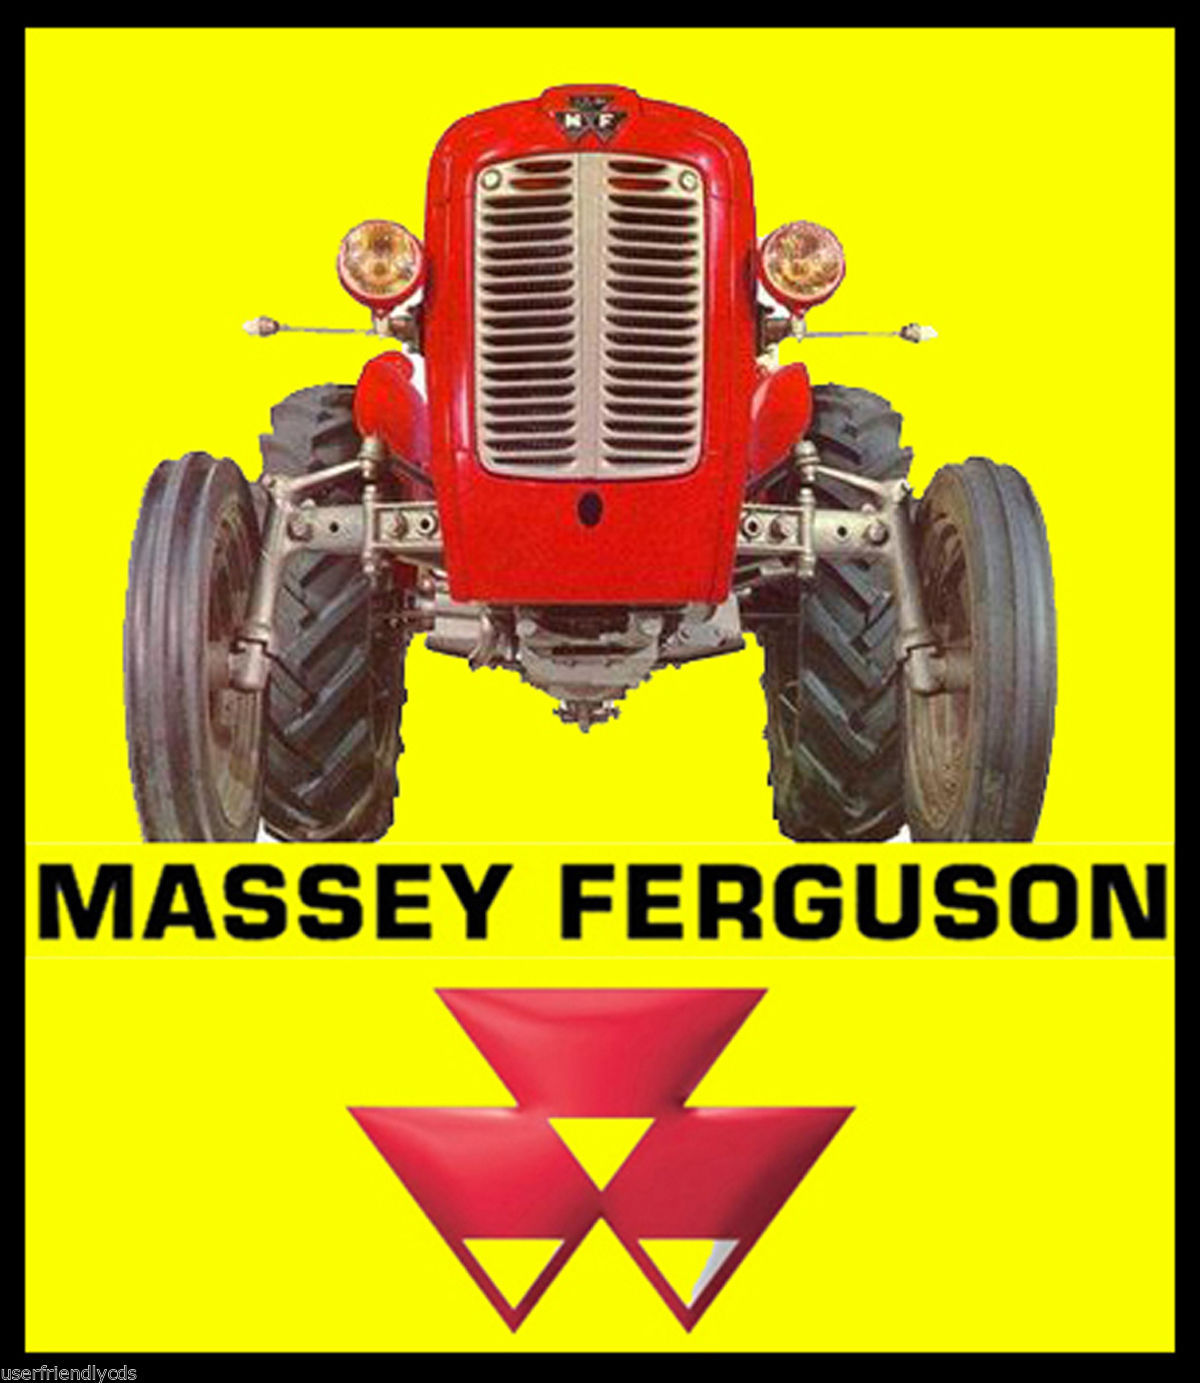 Massey Ferguson Mf300 Tractor Shop Service and 21 similar items. 57